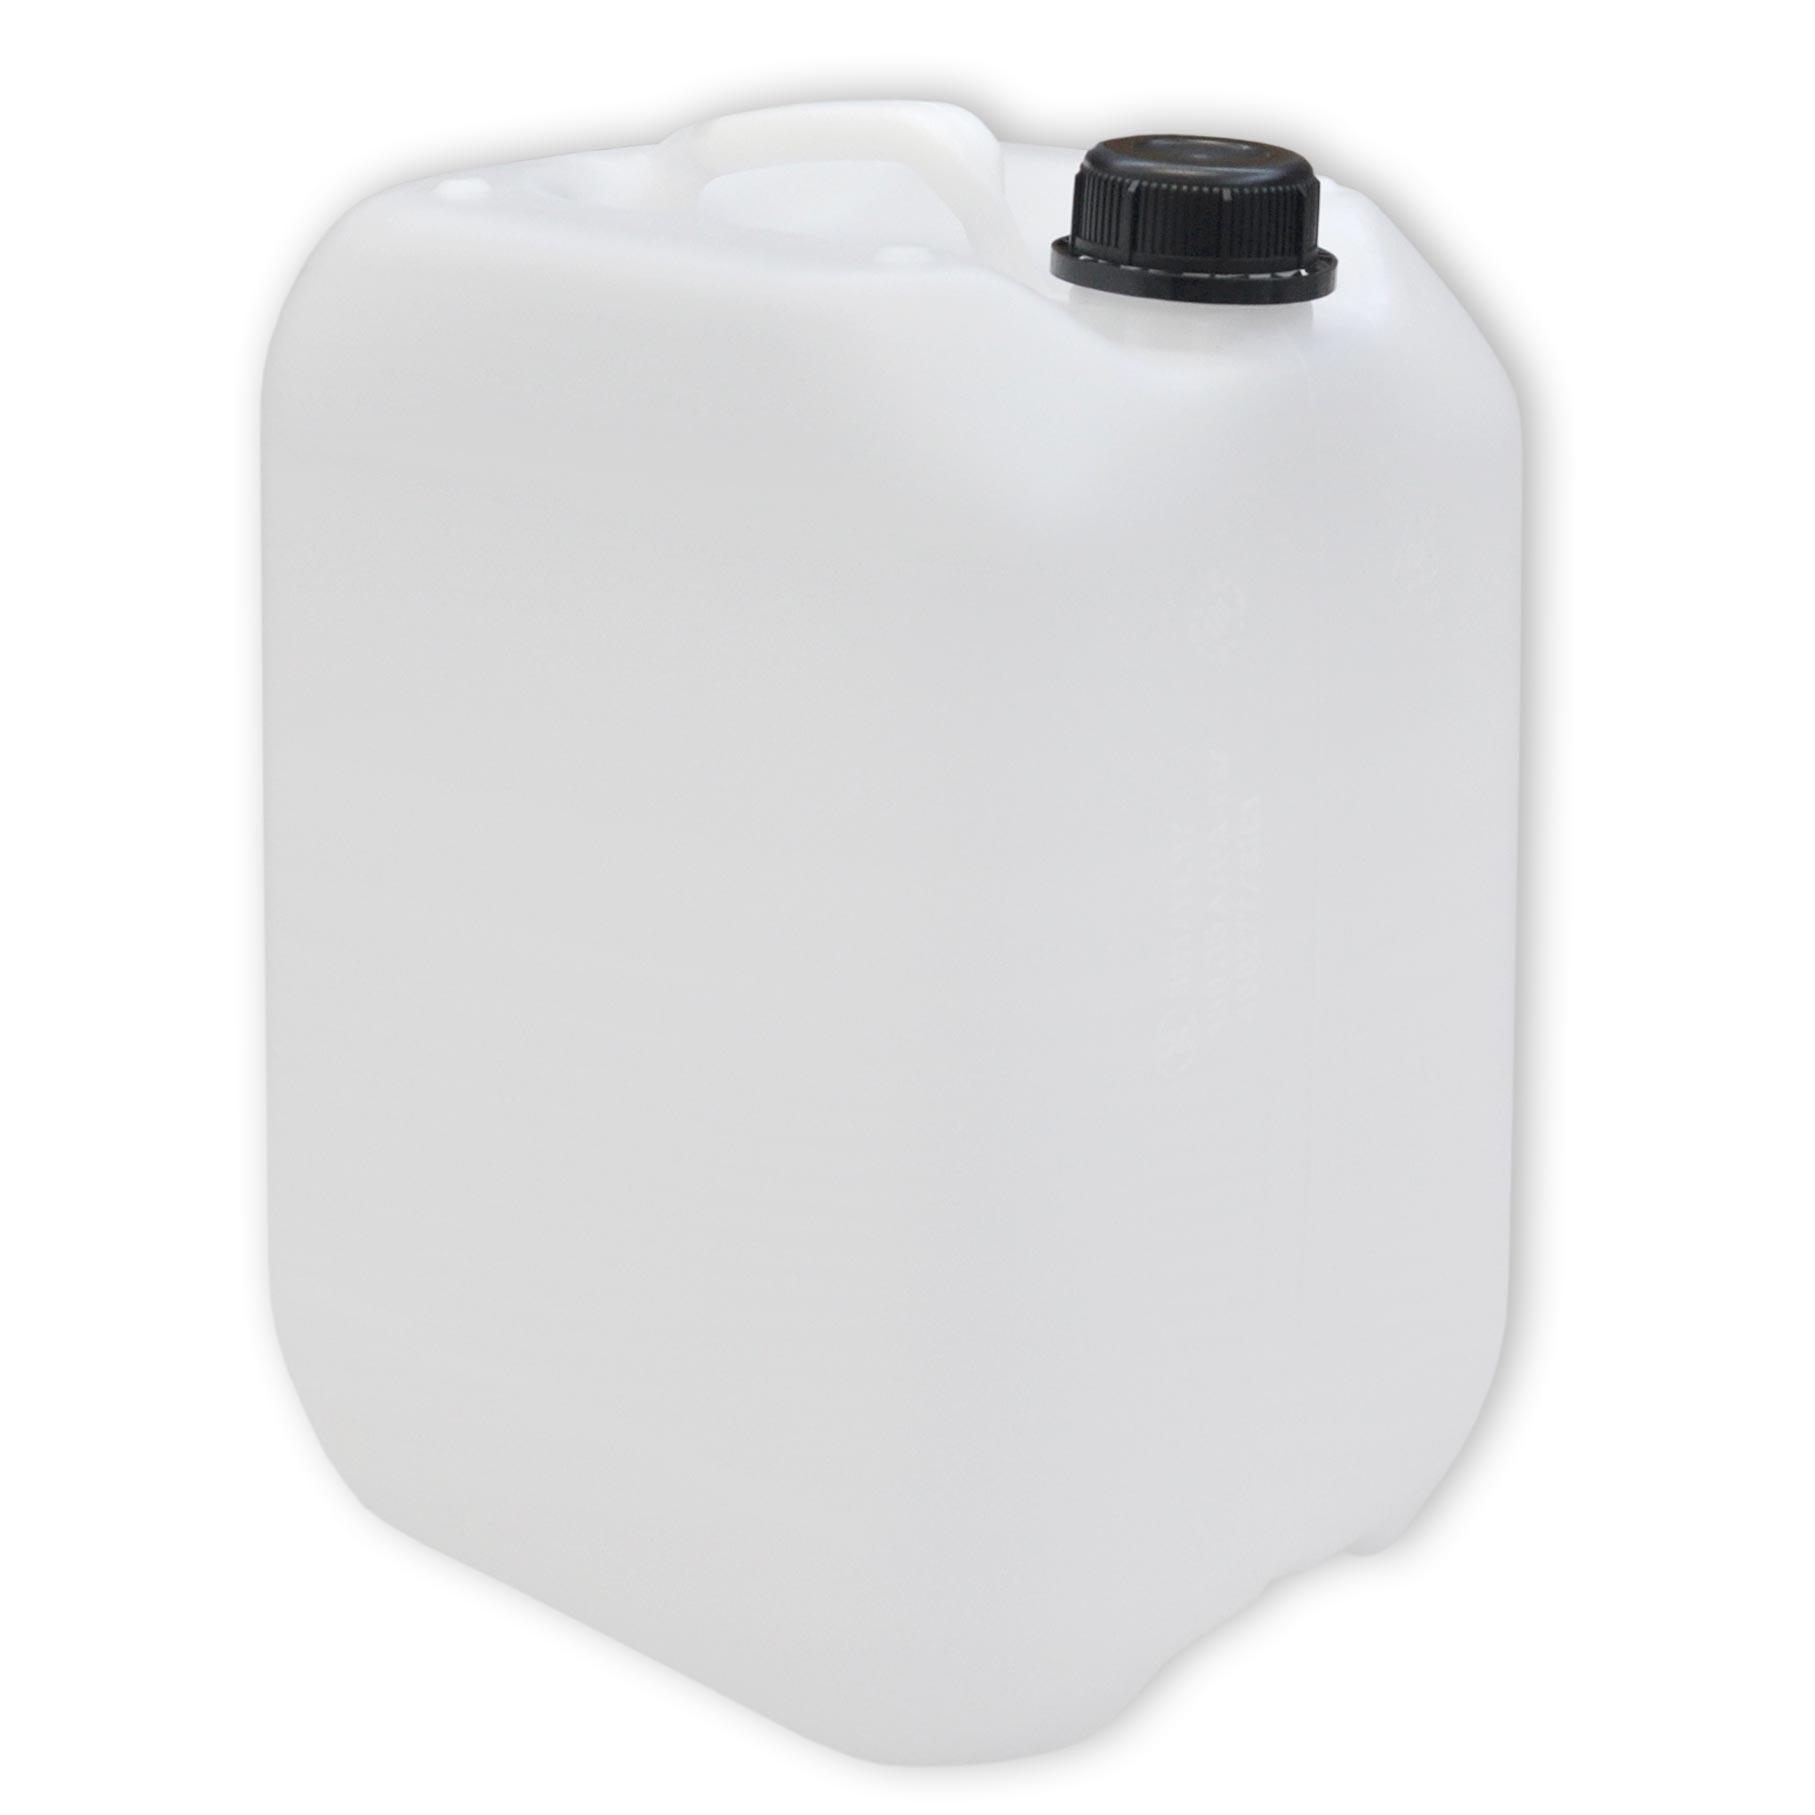 9 Stück 10 L gebrauchte Kanister Farbe natur Camping Plastekanister DIN45